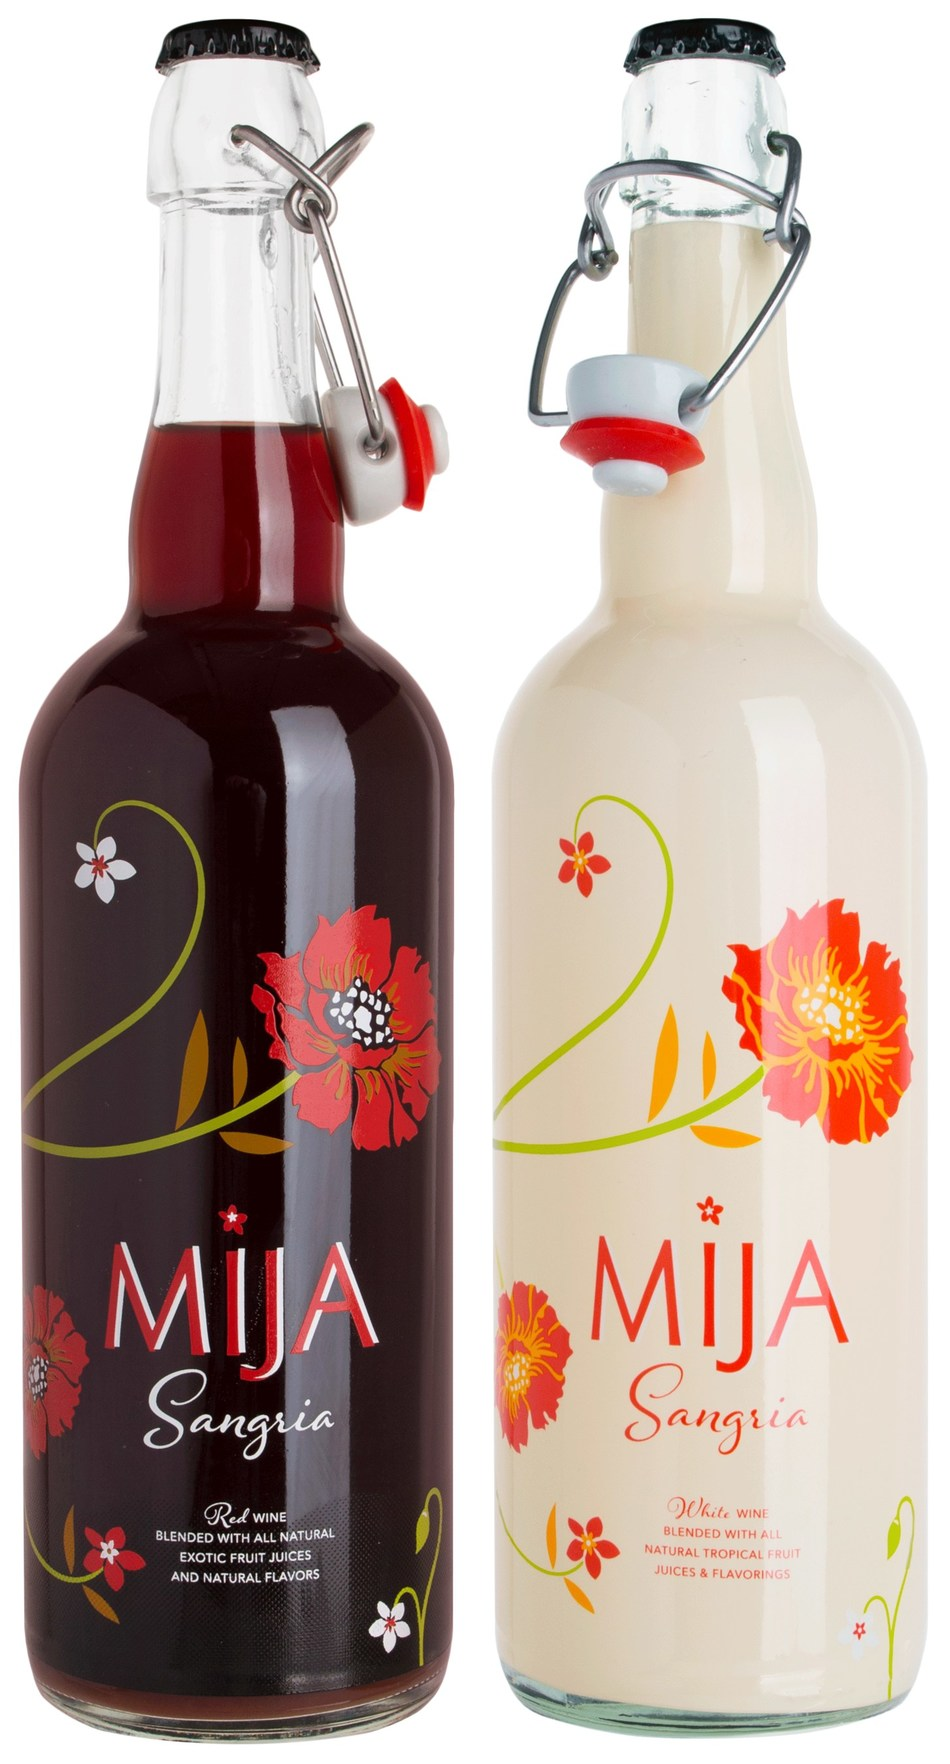 The Mija Sangria portfolio